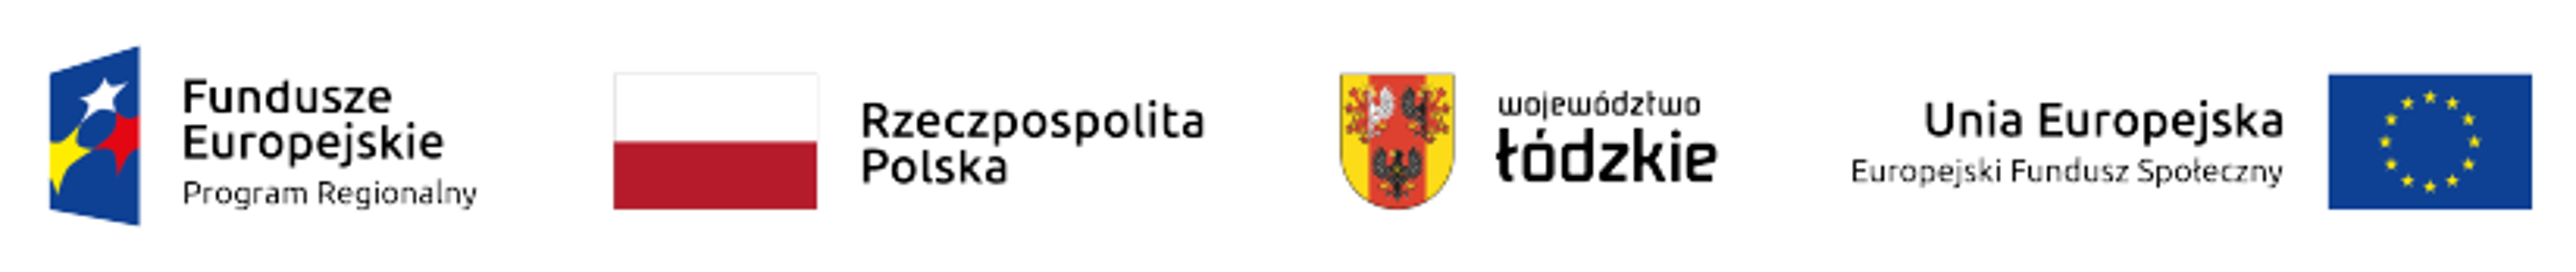 http://wsparciespoleczne.pl/wp-content/uploads/2021/09/listownik-kolor-gora-2021.png